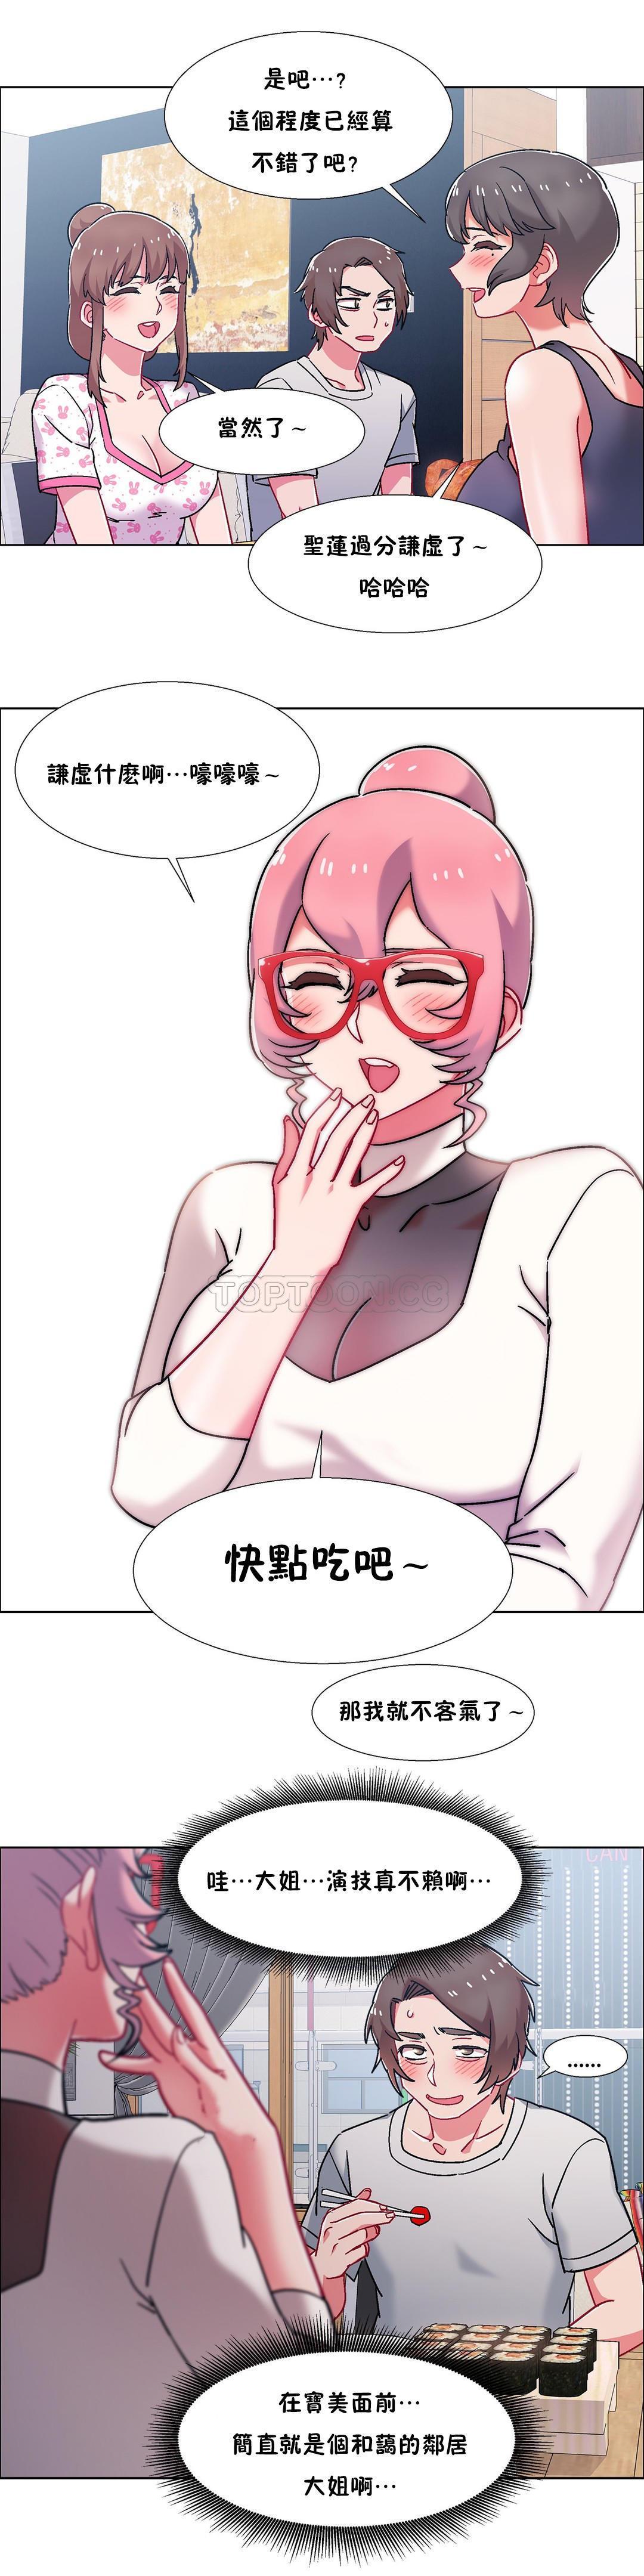 [Studio Wannabe] Rental Girls | 出租女郎 Ch. 33-58 [Chinese]  第二季 完结 522